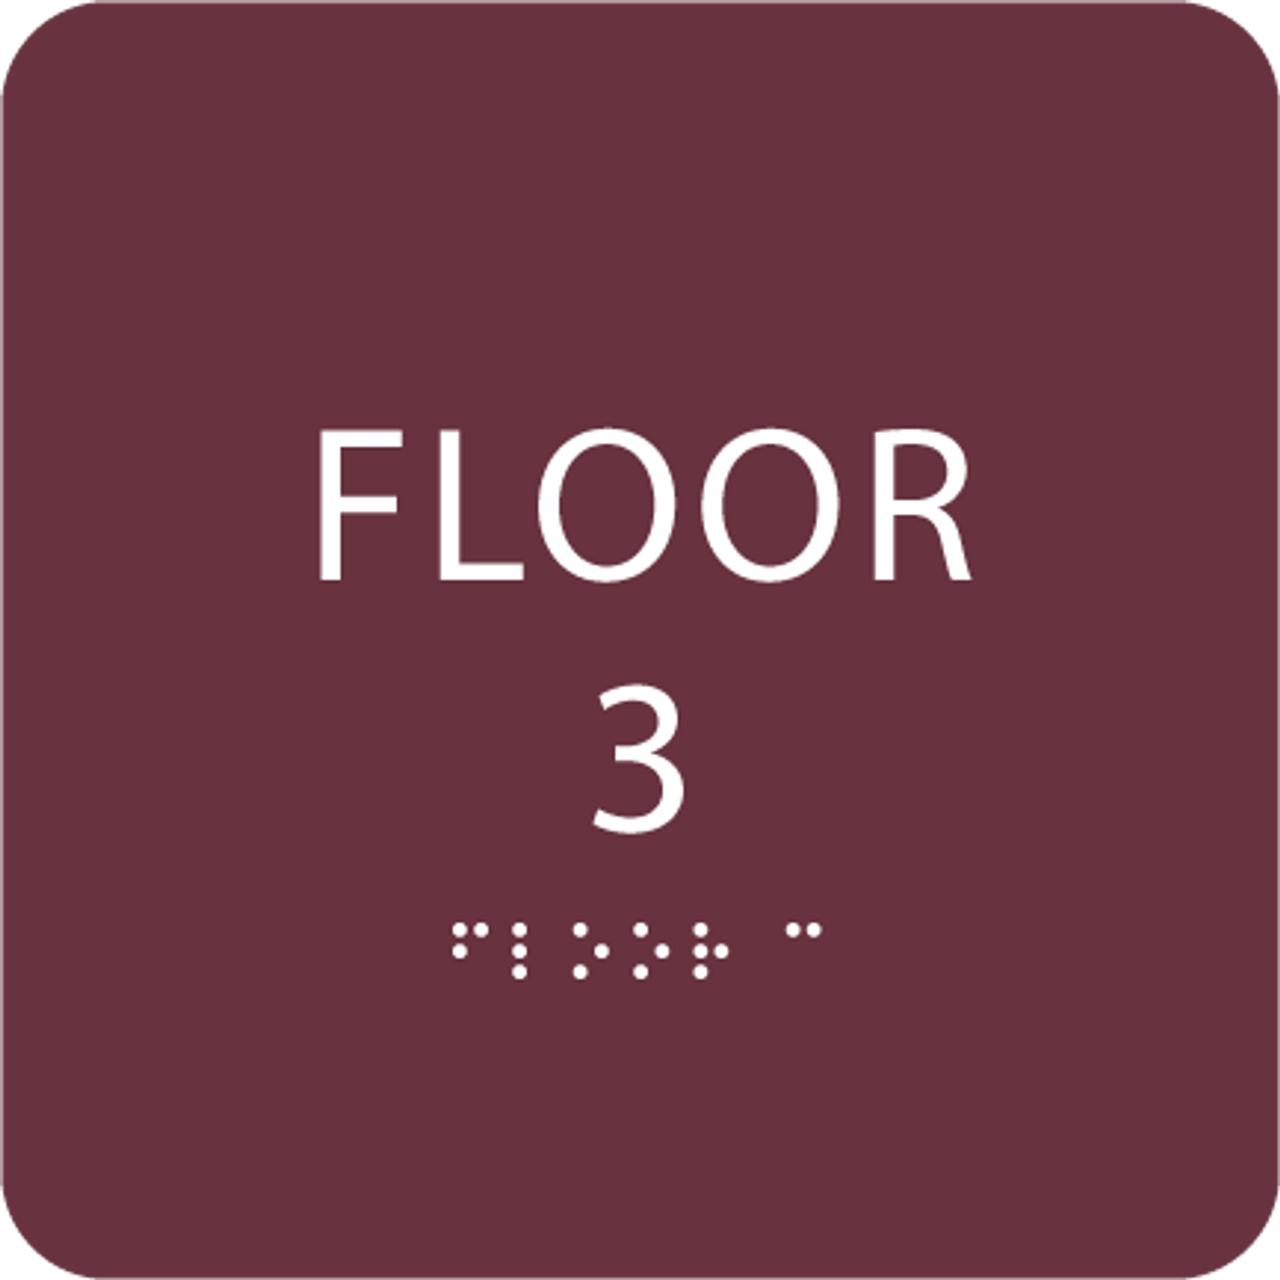 Burgundy Floor 3 Identification Sign